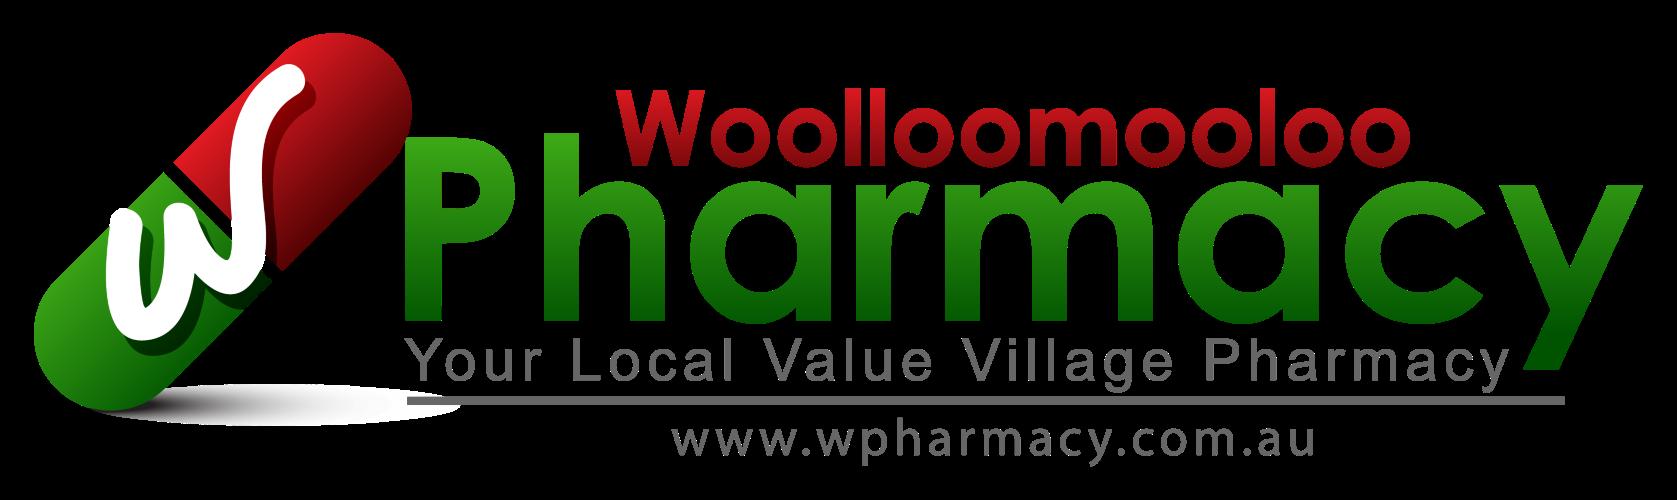 Woolloomooloo Pharmacy Sydney Chemist Local Village